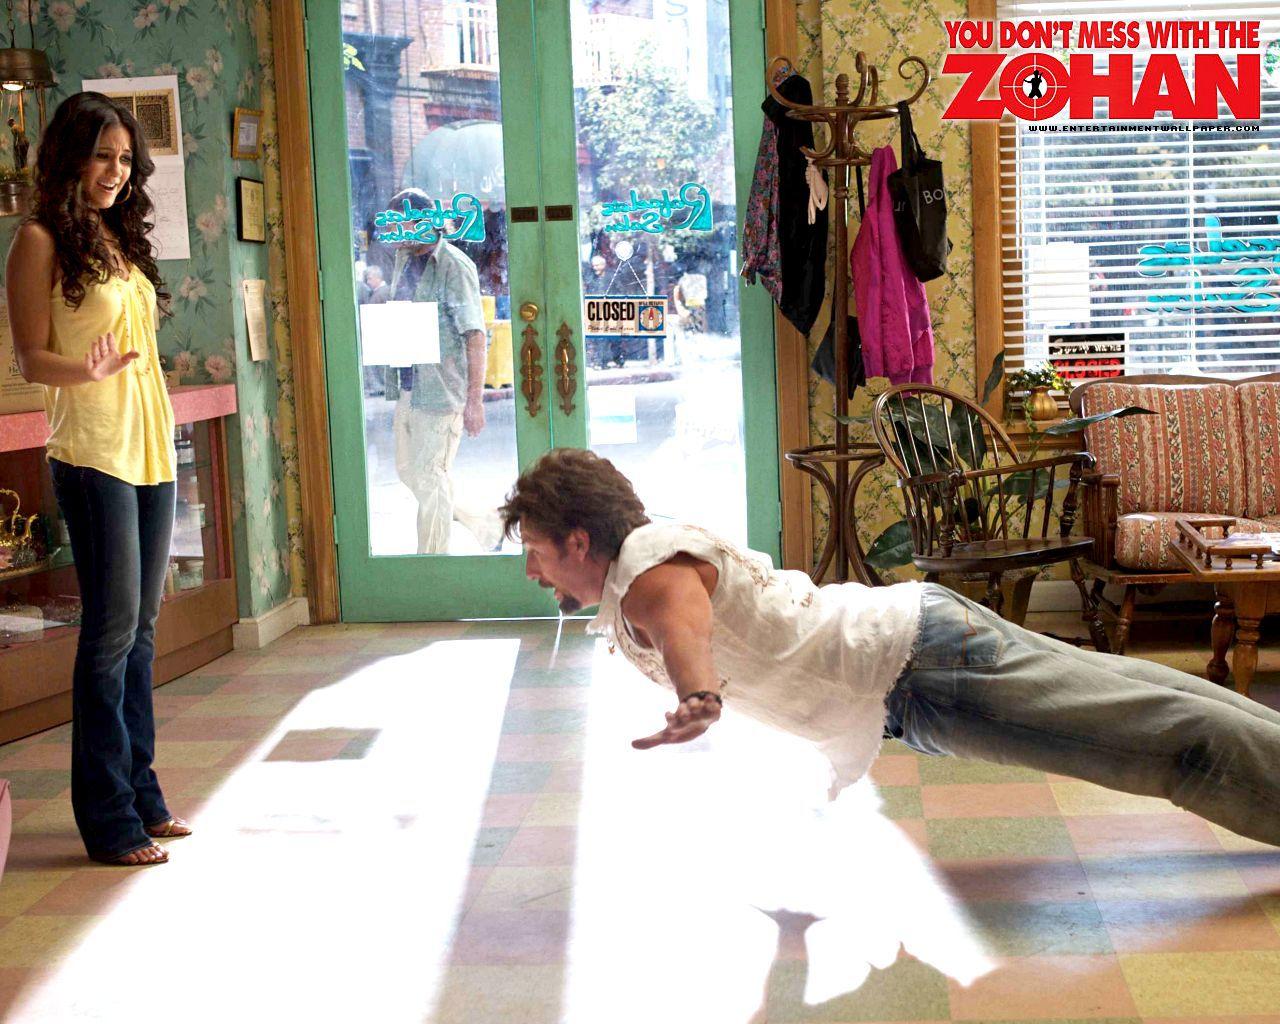 http://2.bp.blogspot.com/-9wOcRrOx_Fw/Tj5LKLYNWkI/AAAAAAAAKR4/4XUDRiEiszo/s1600/you_don_t_mess_with_the_zohan12.jpg